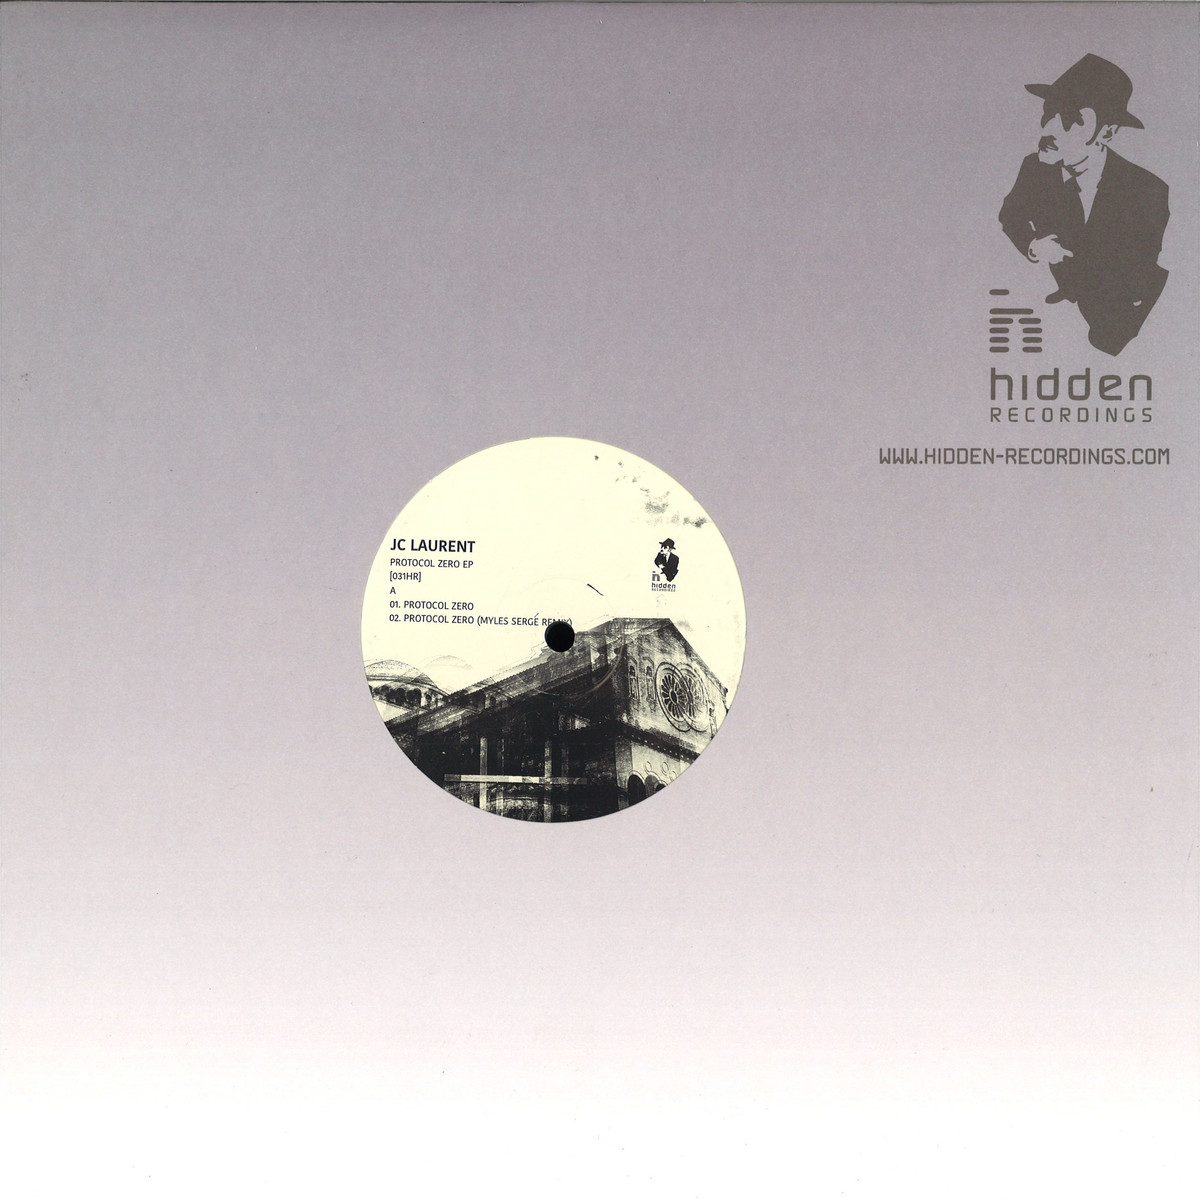 JC Laurent - Protocol Zero EP (Hidden Recordings)